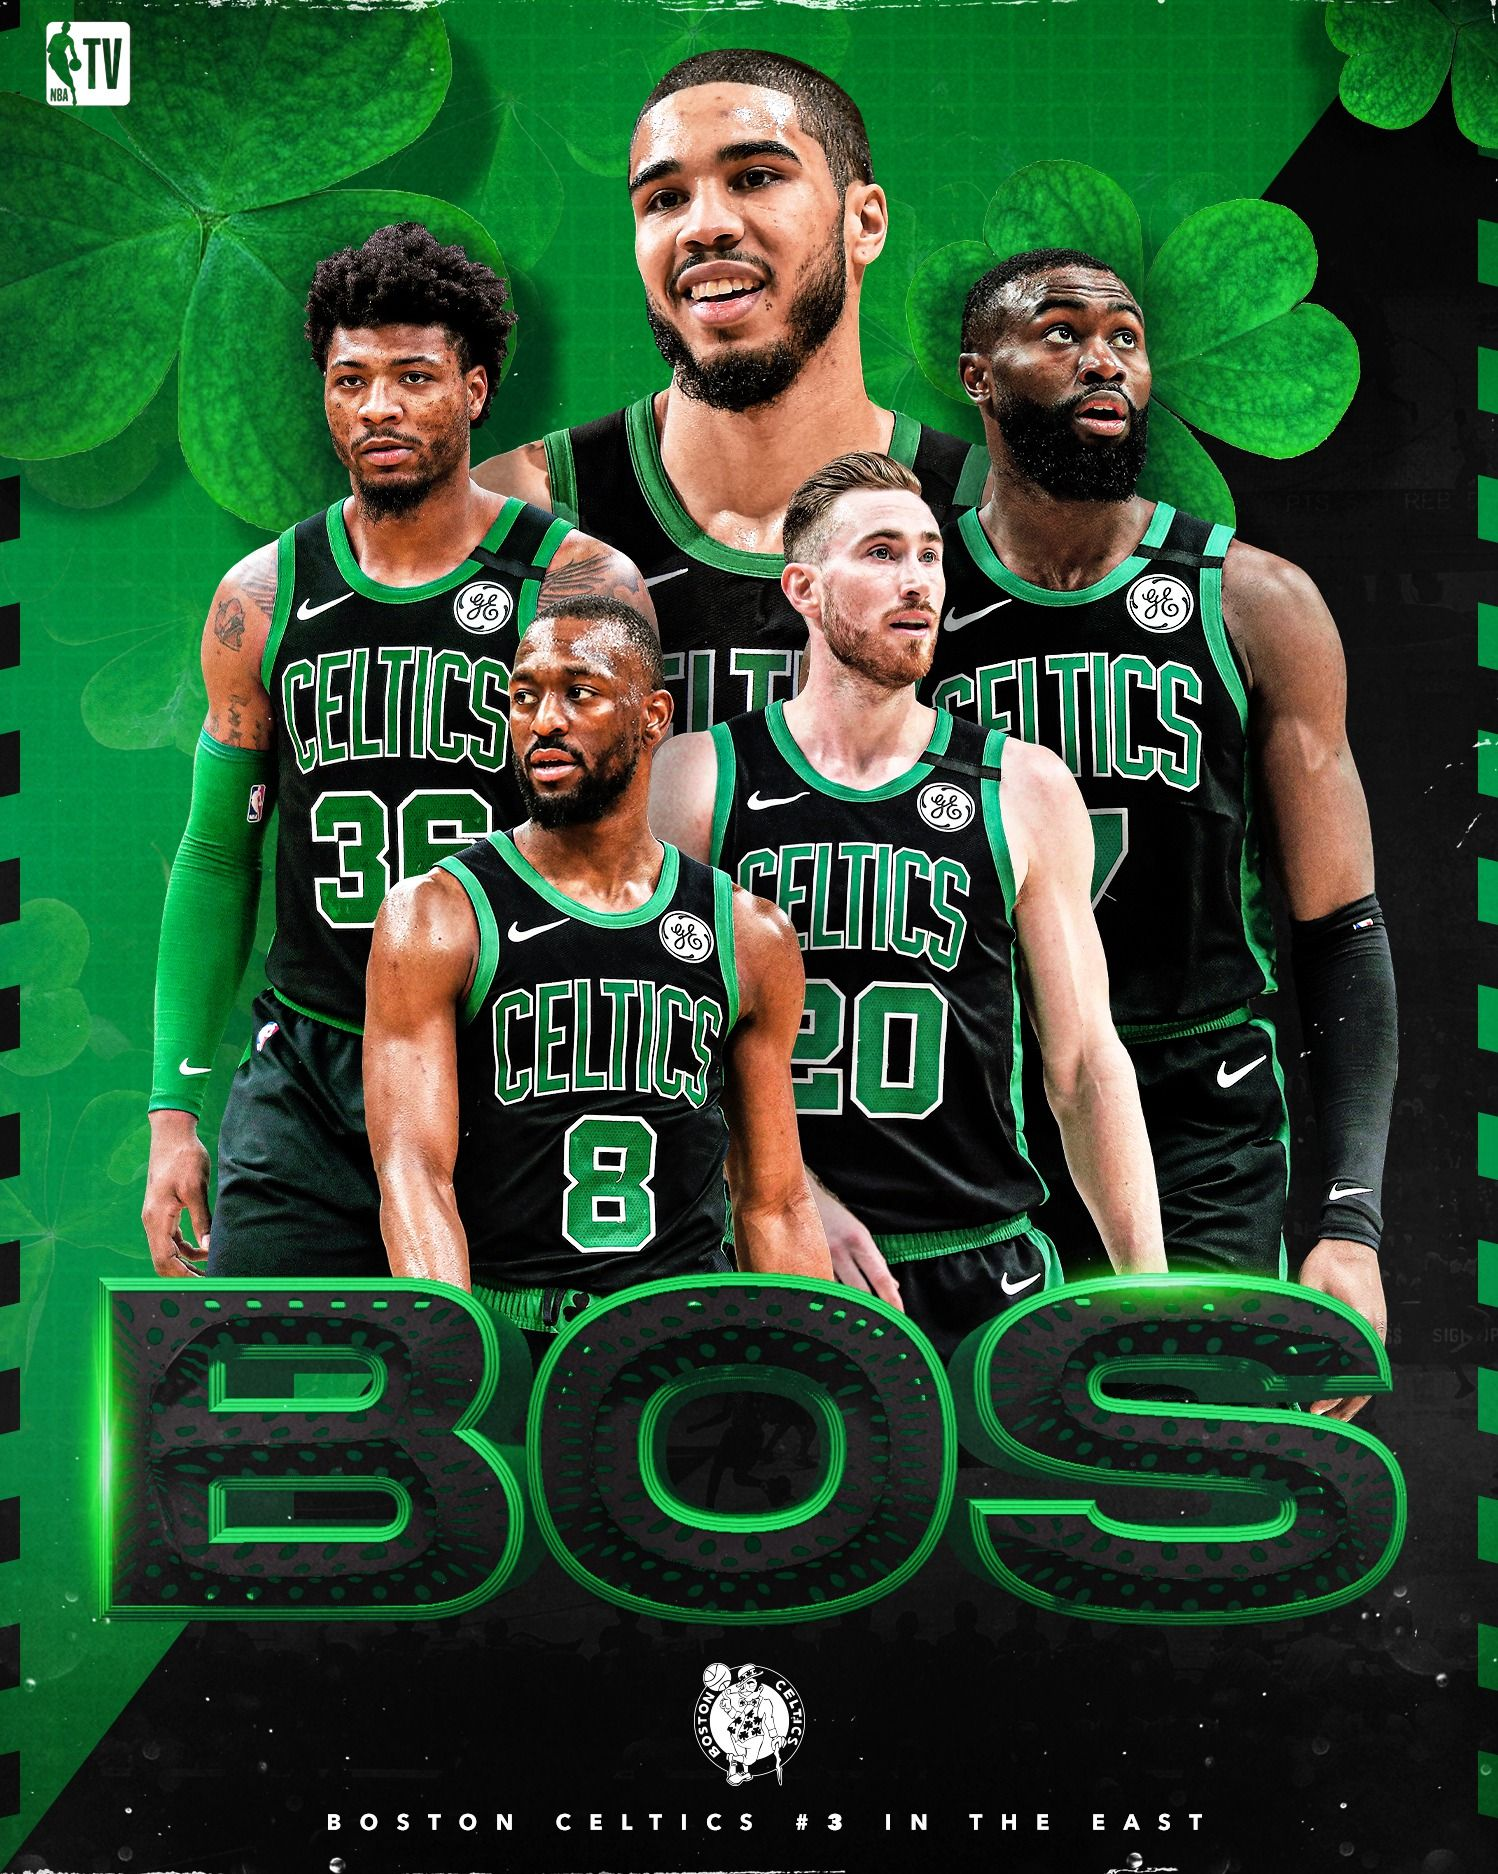 Nba Tv On Twitter Boston Celtics Wallpaper Nba Tv Boston Celtics